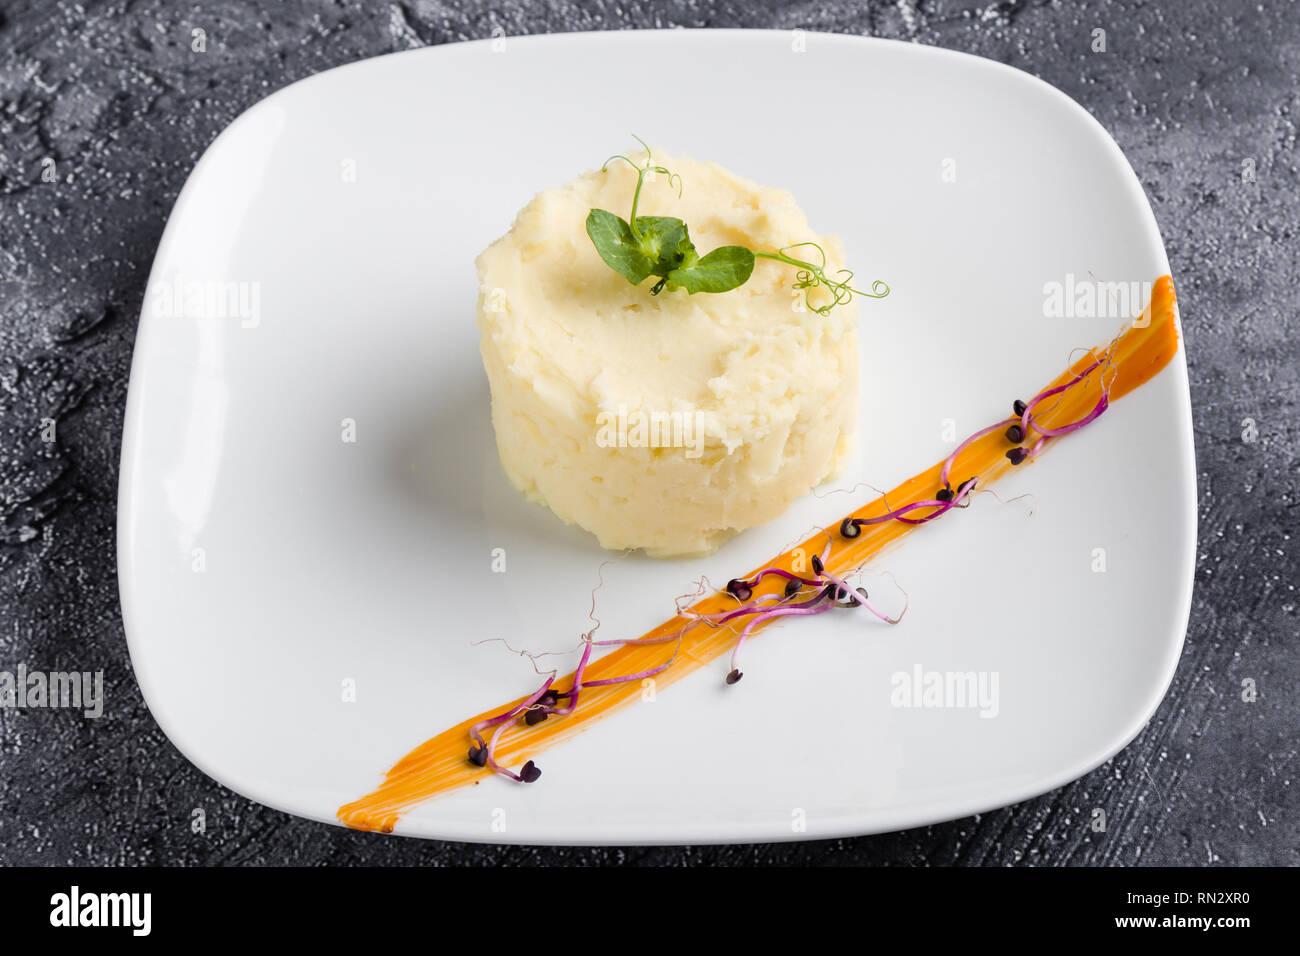 fresh mashed potato portion on white plate - Stock Image